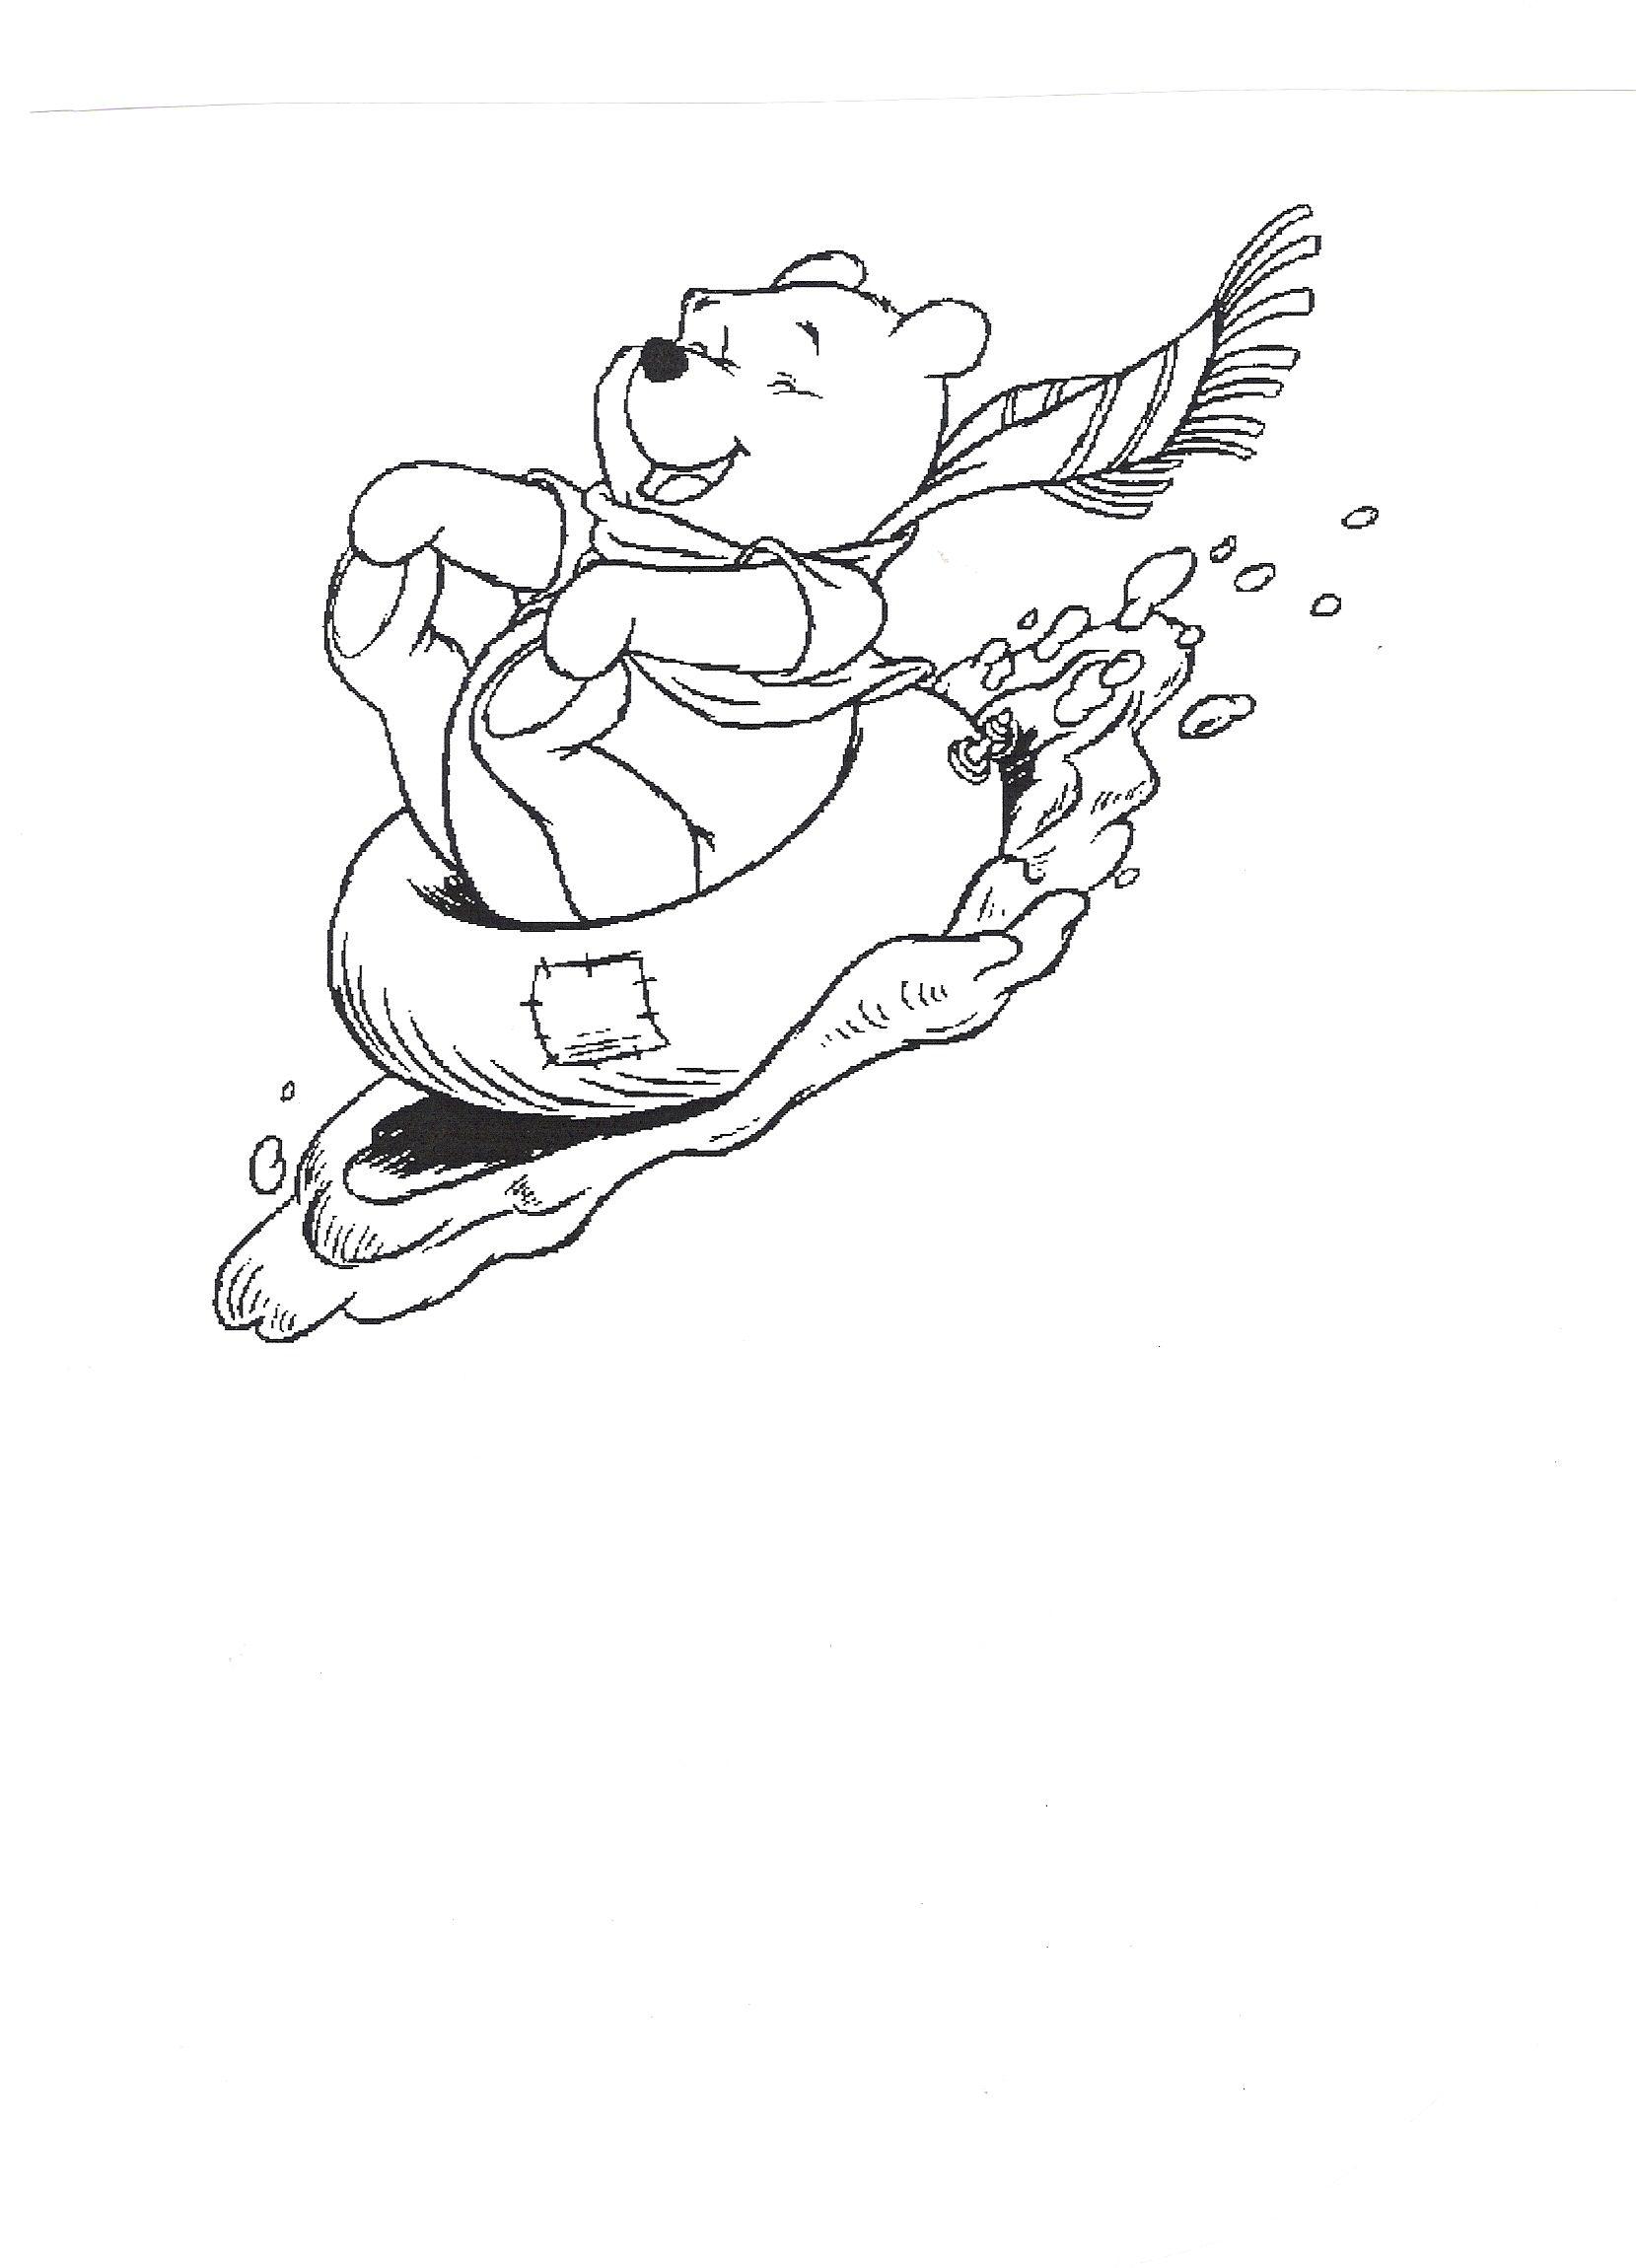 Pin de Silvia Poblete en fotocopias | Pinterest | Winnie de pooh